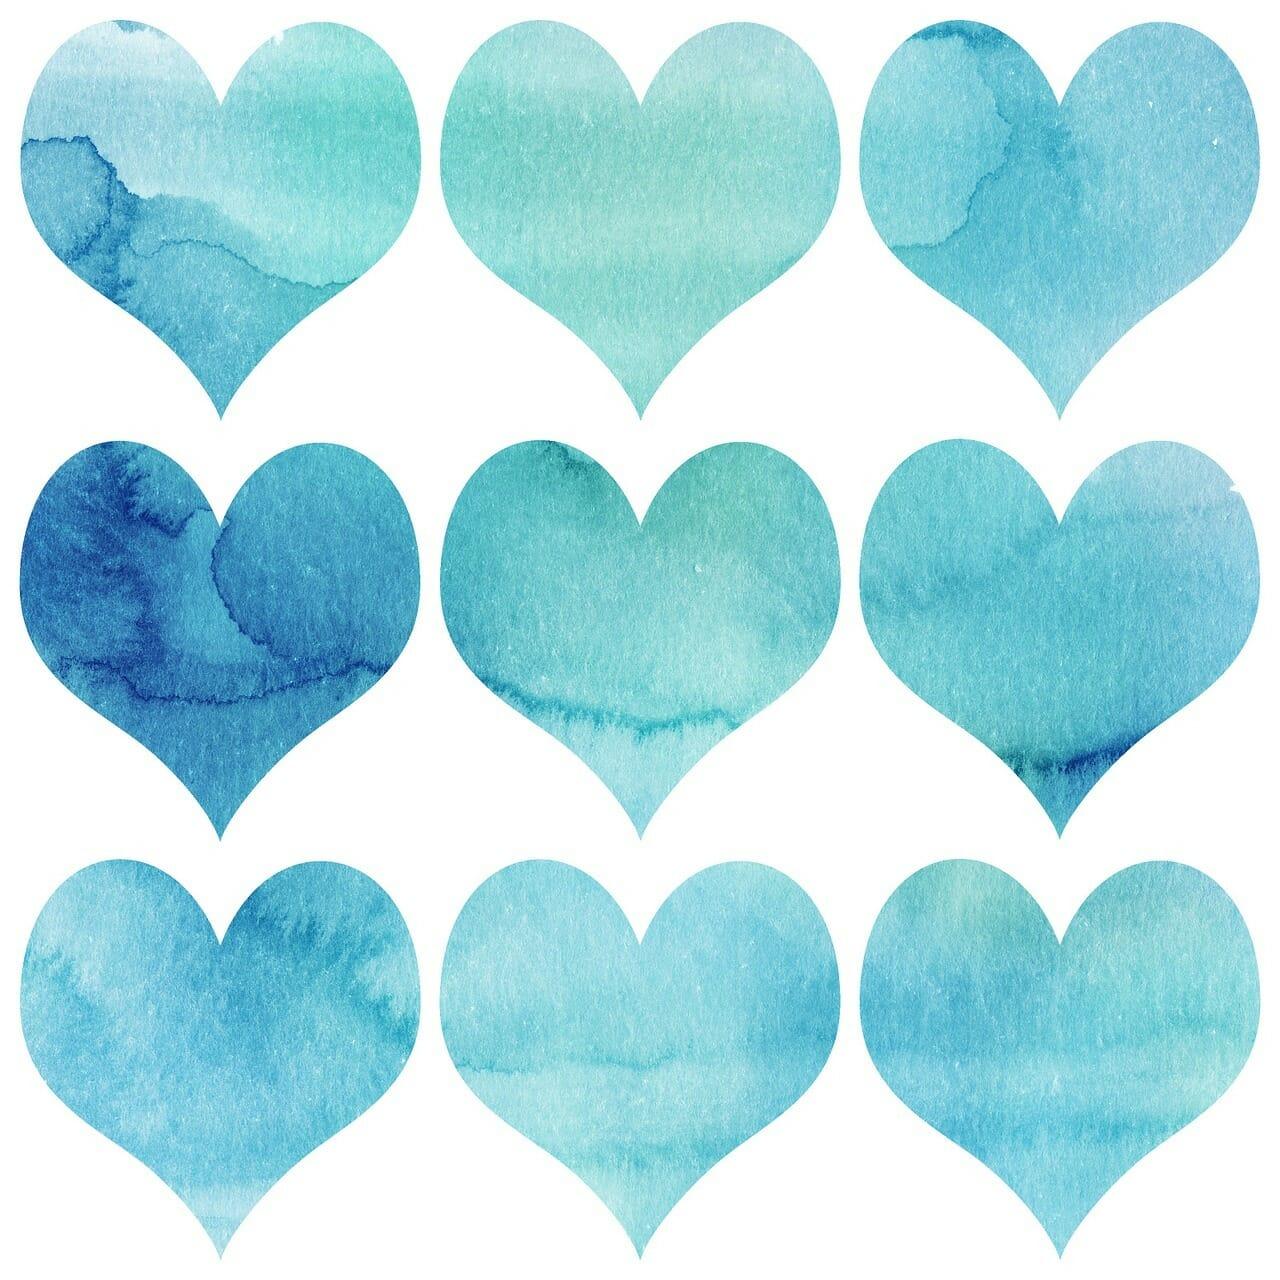 Watercolor of blue hearts